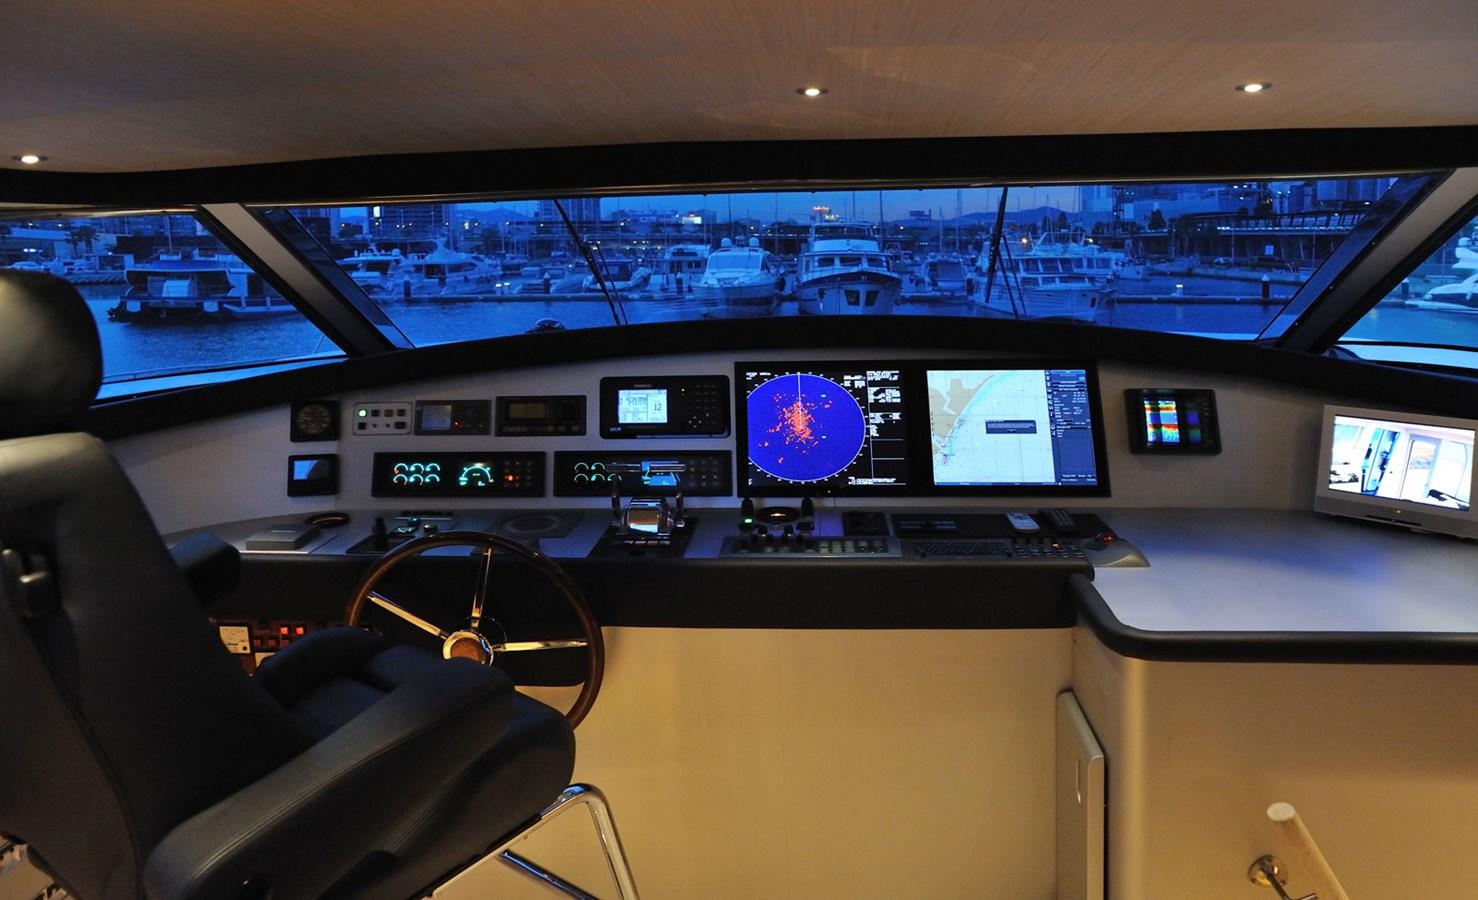 Mondomarine 85 Petardo - Wheelhouse Night 1995 MondoMarine 85 C Motor Yacht 2735401